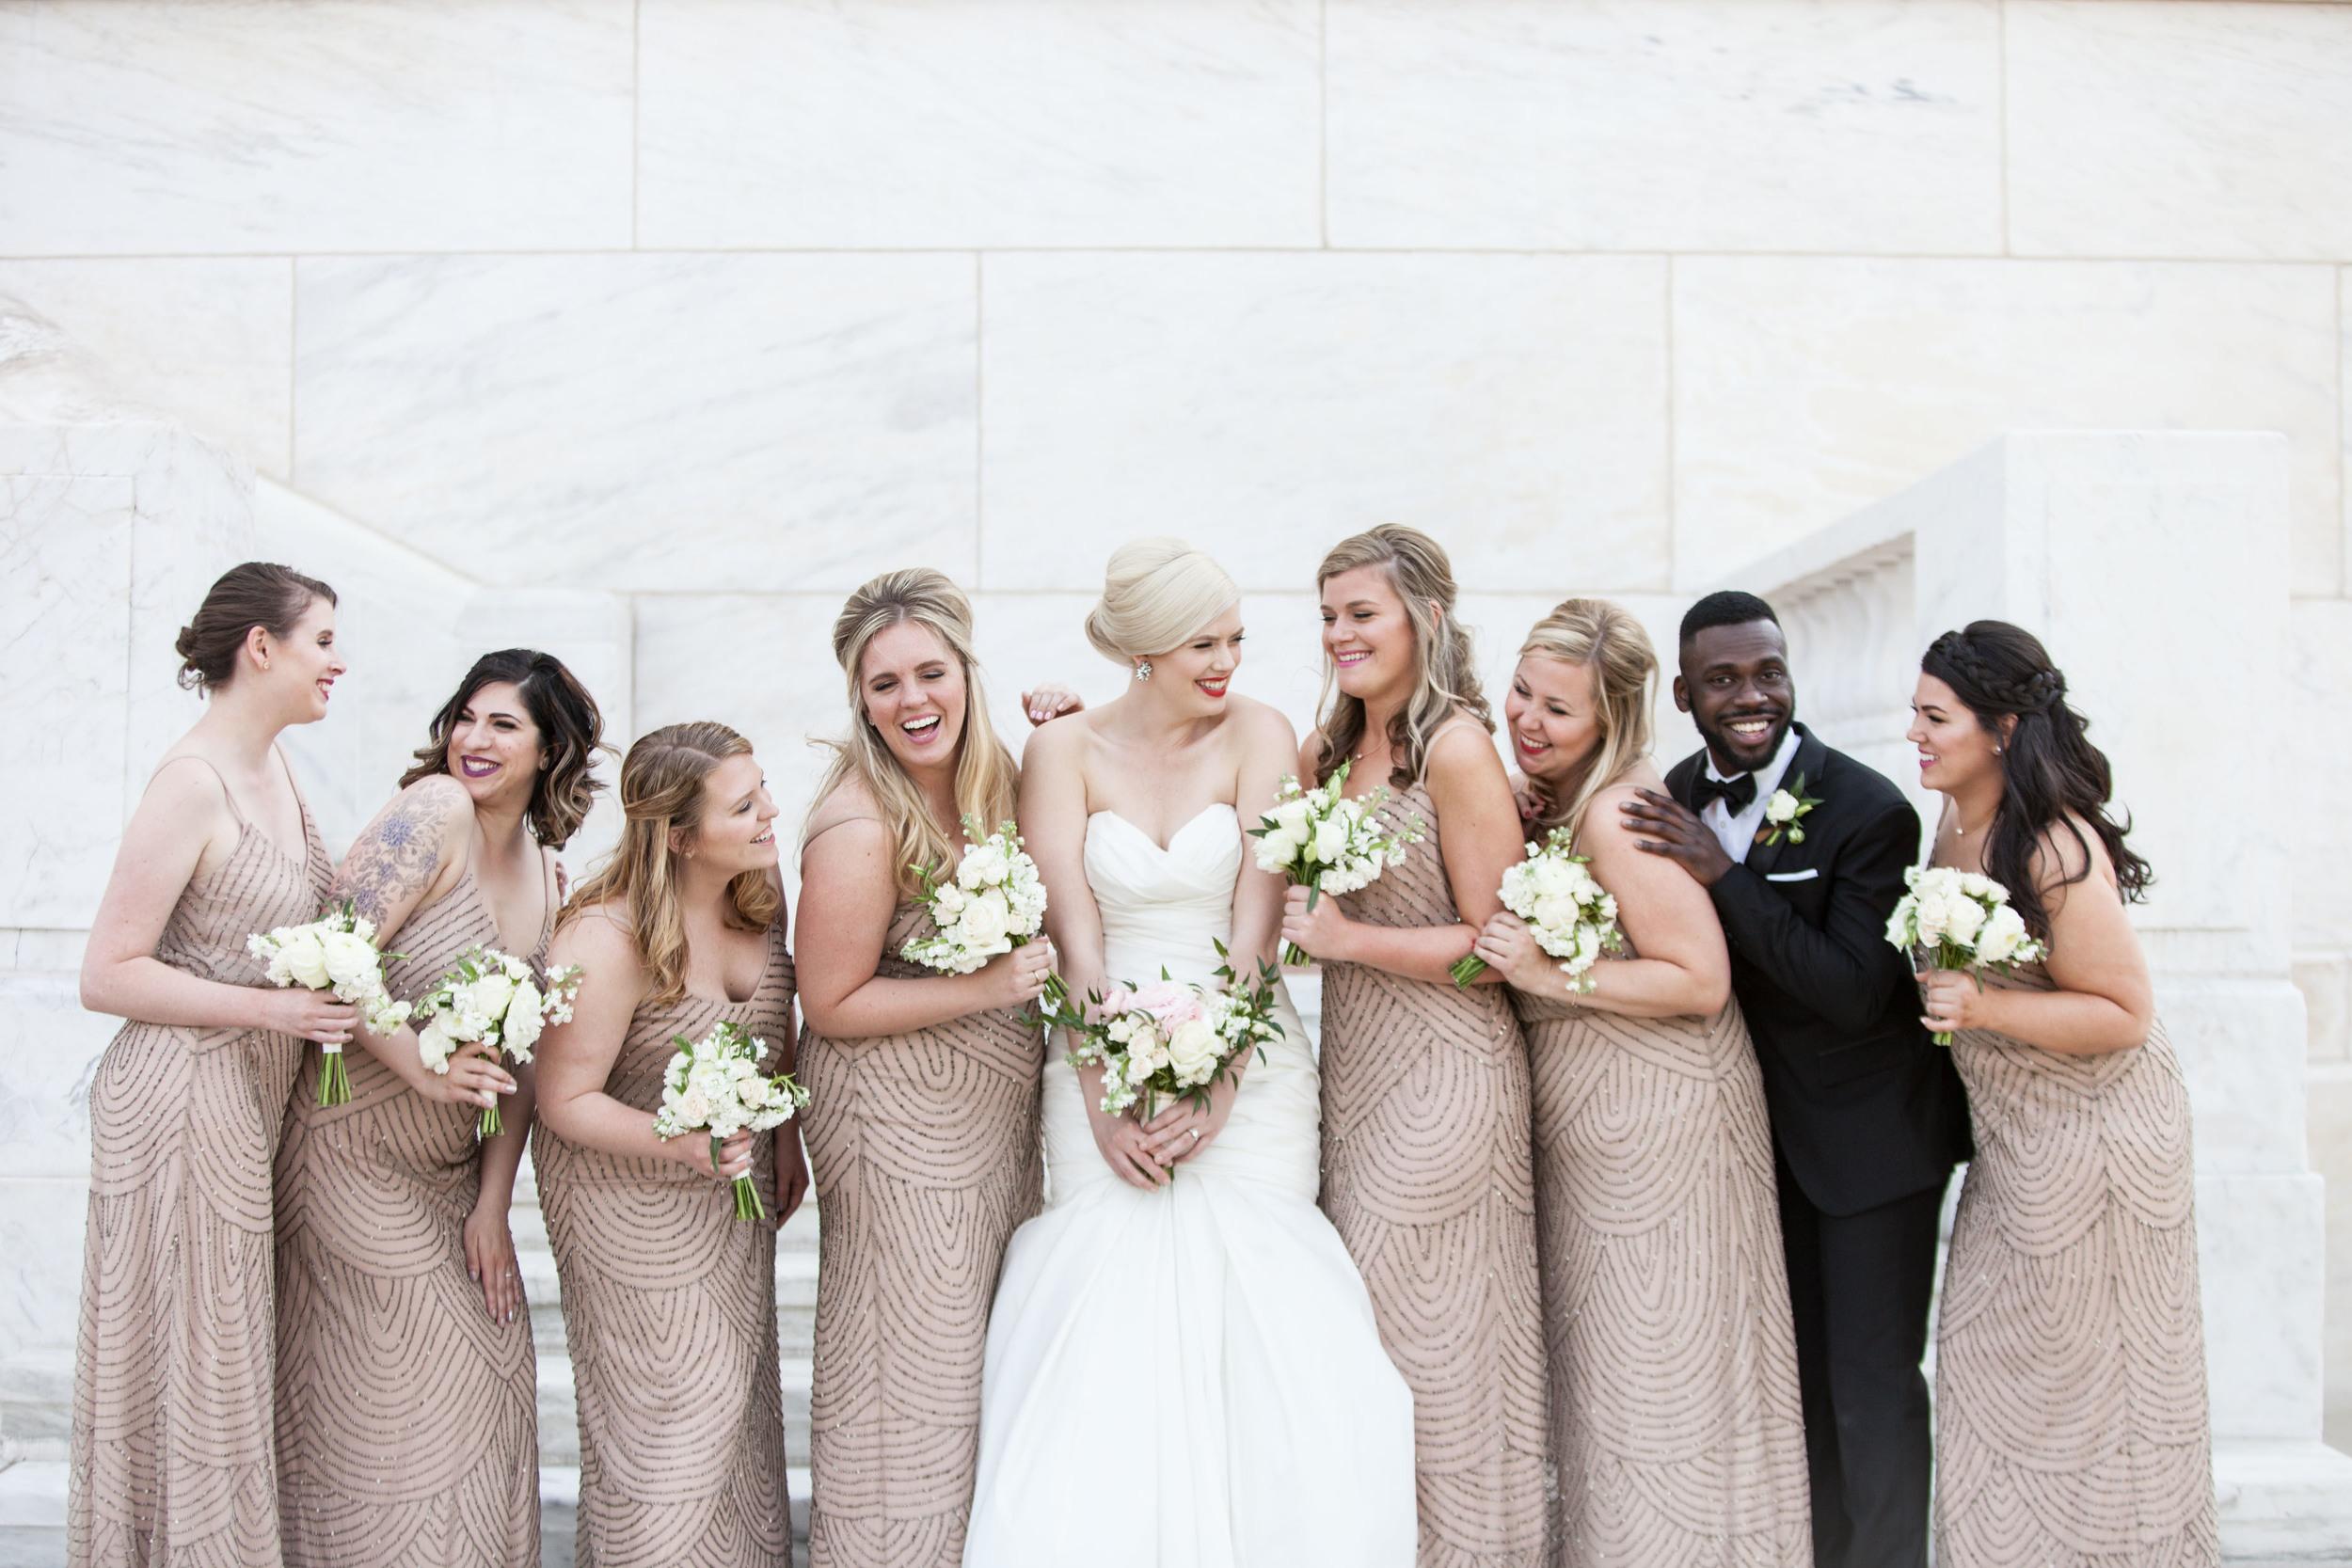 Cottrell Wedding - Natalie Probst Photography447.jpg